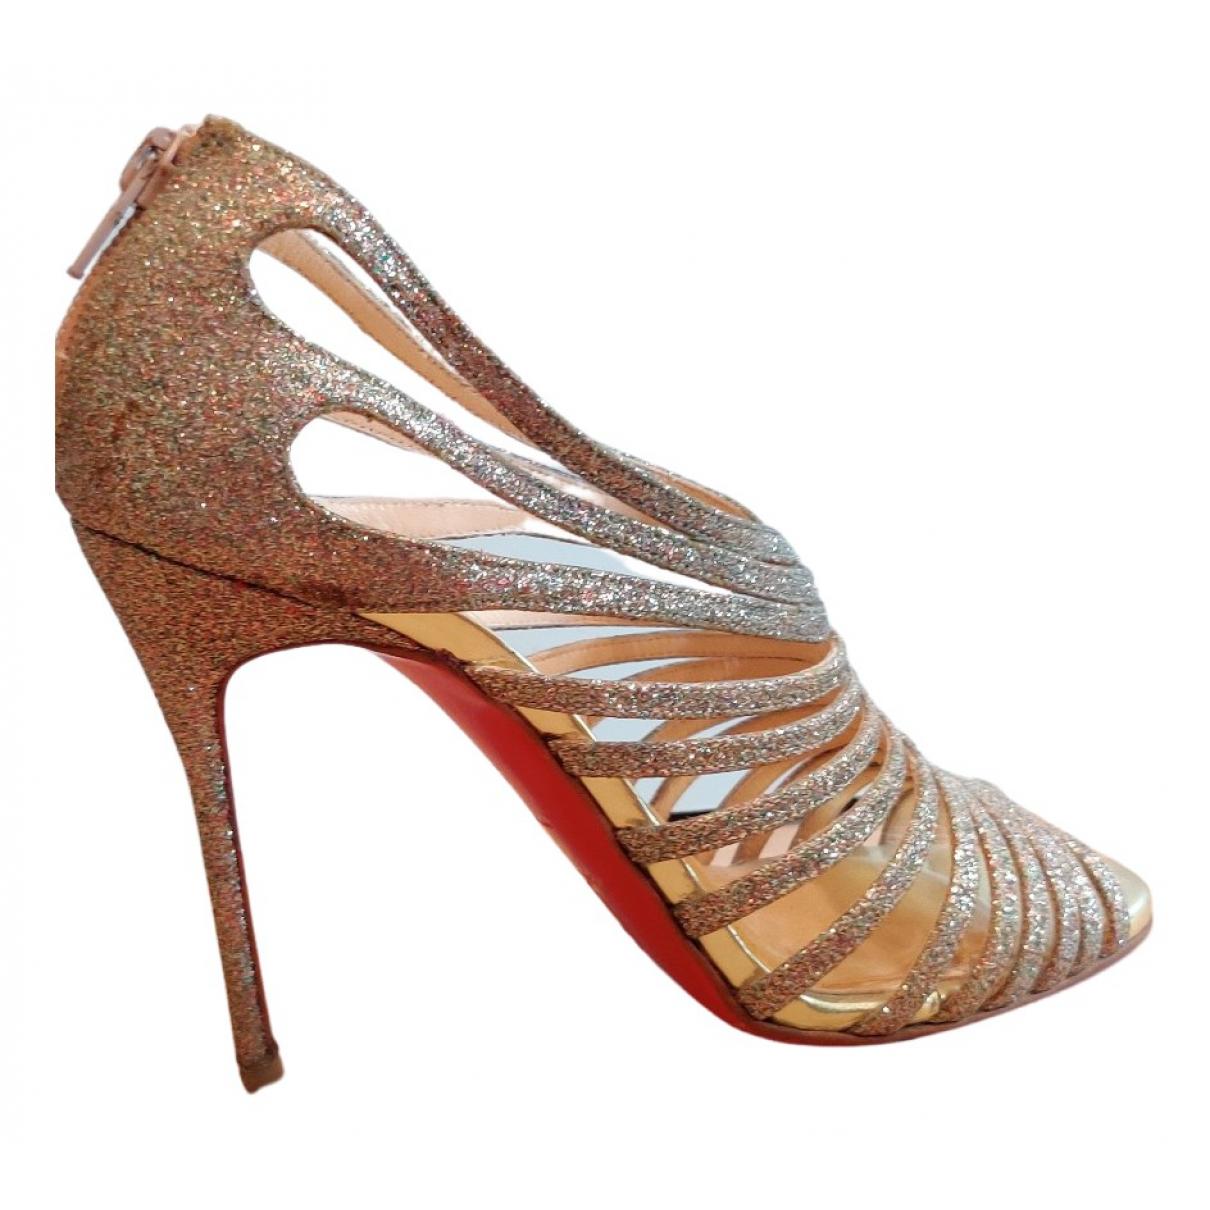 Christian Louboutin \N Gold Glitter Sandals for Women 36.5 EU